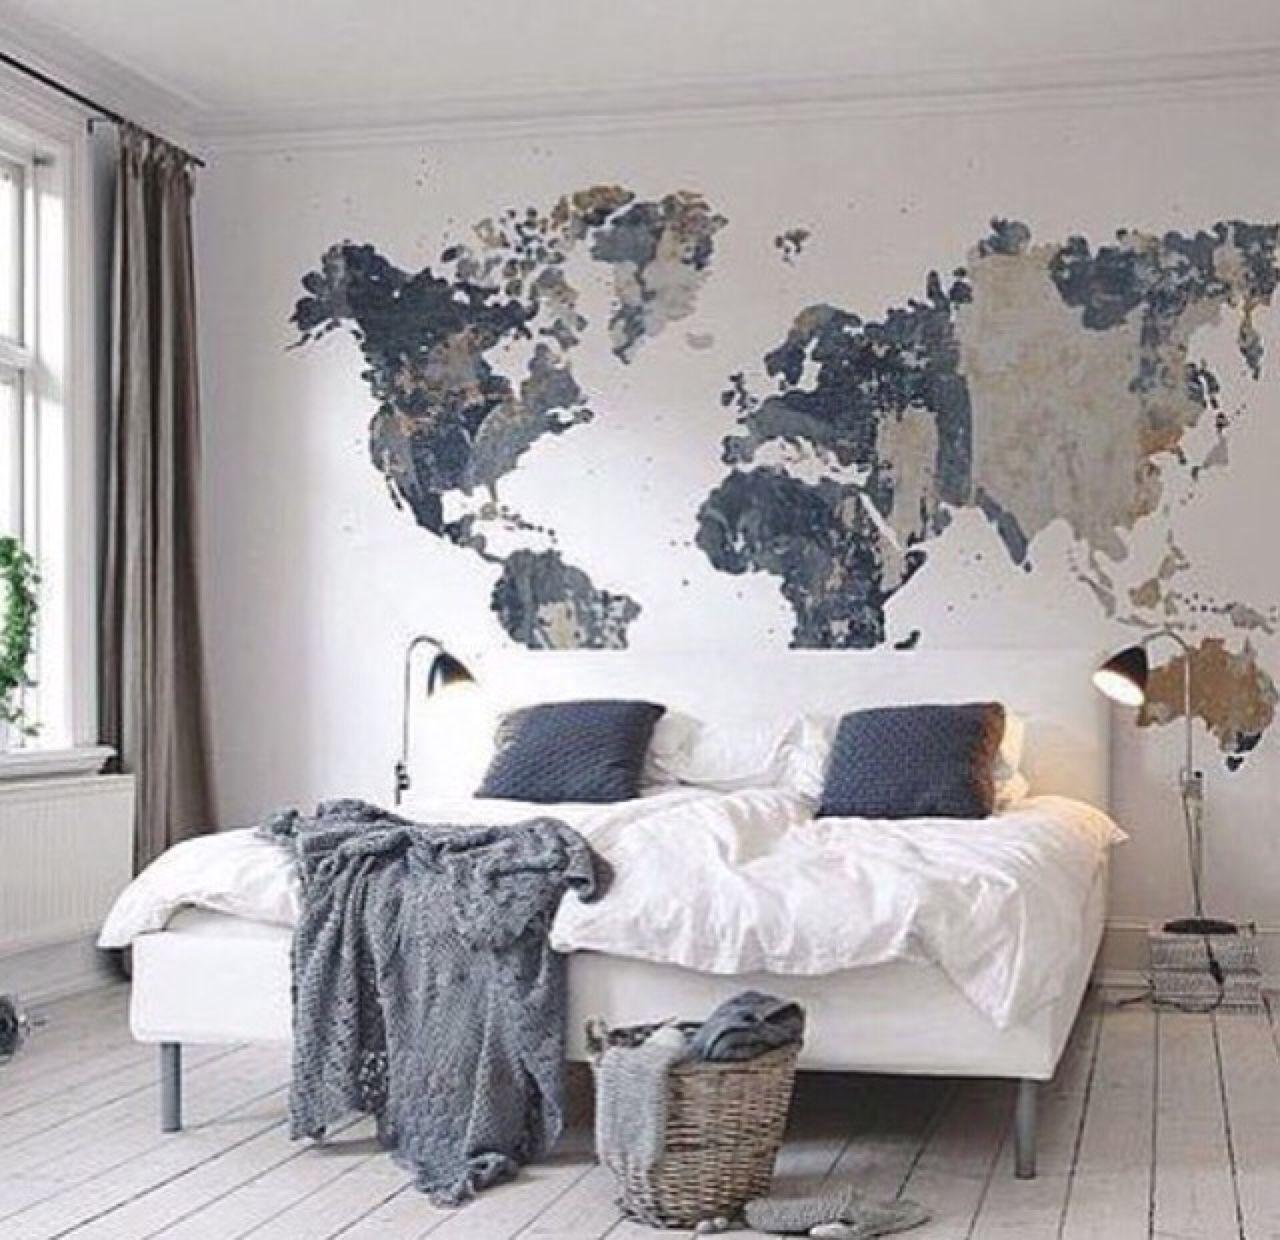 cool map mural See various wall mural designs at http